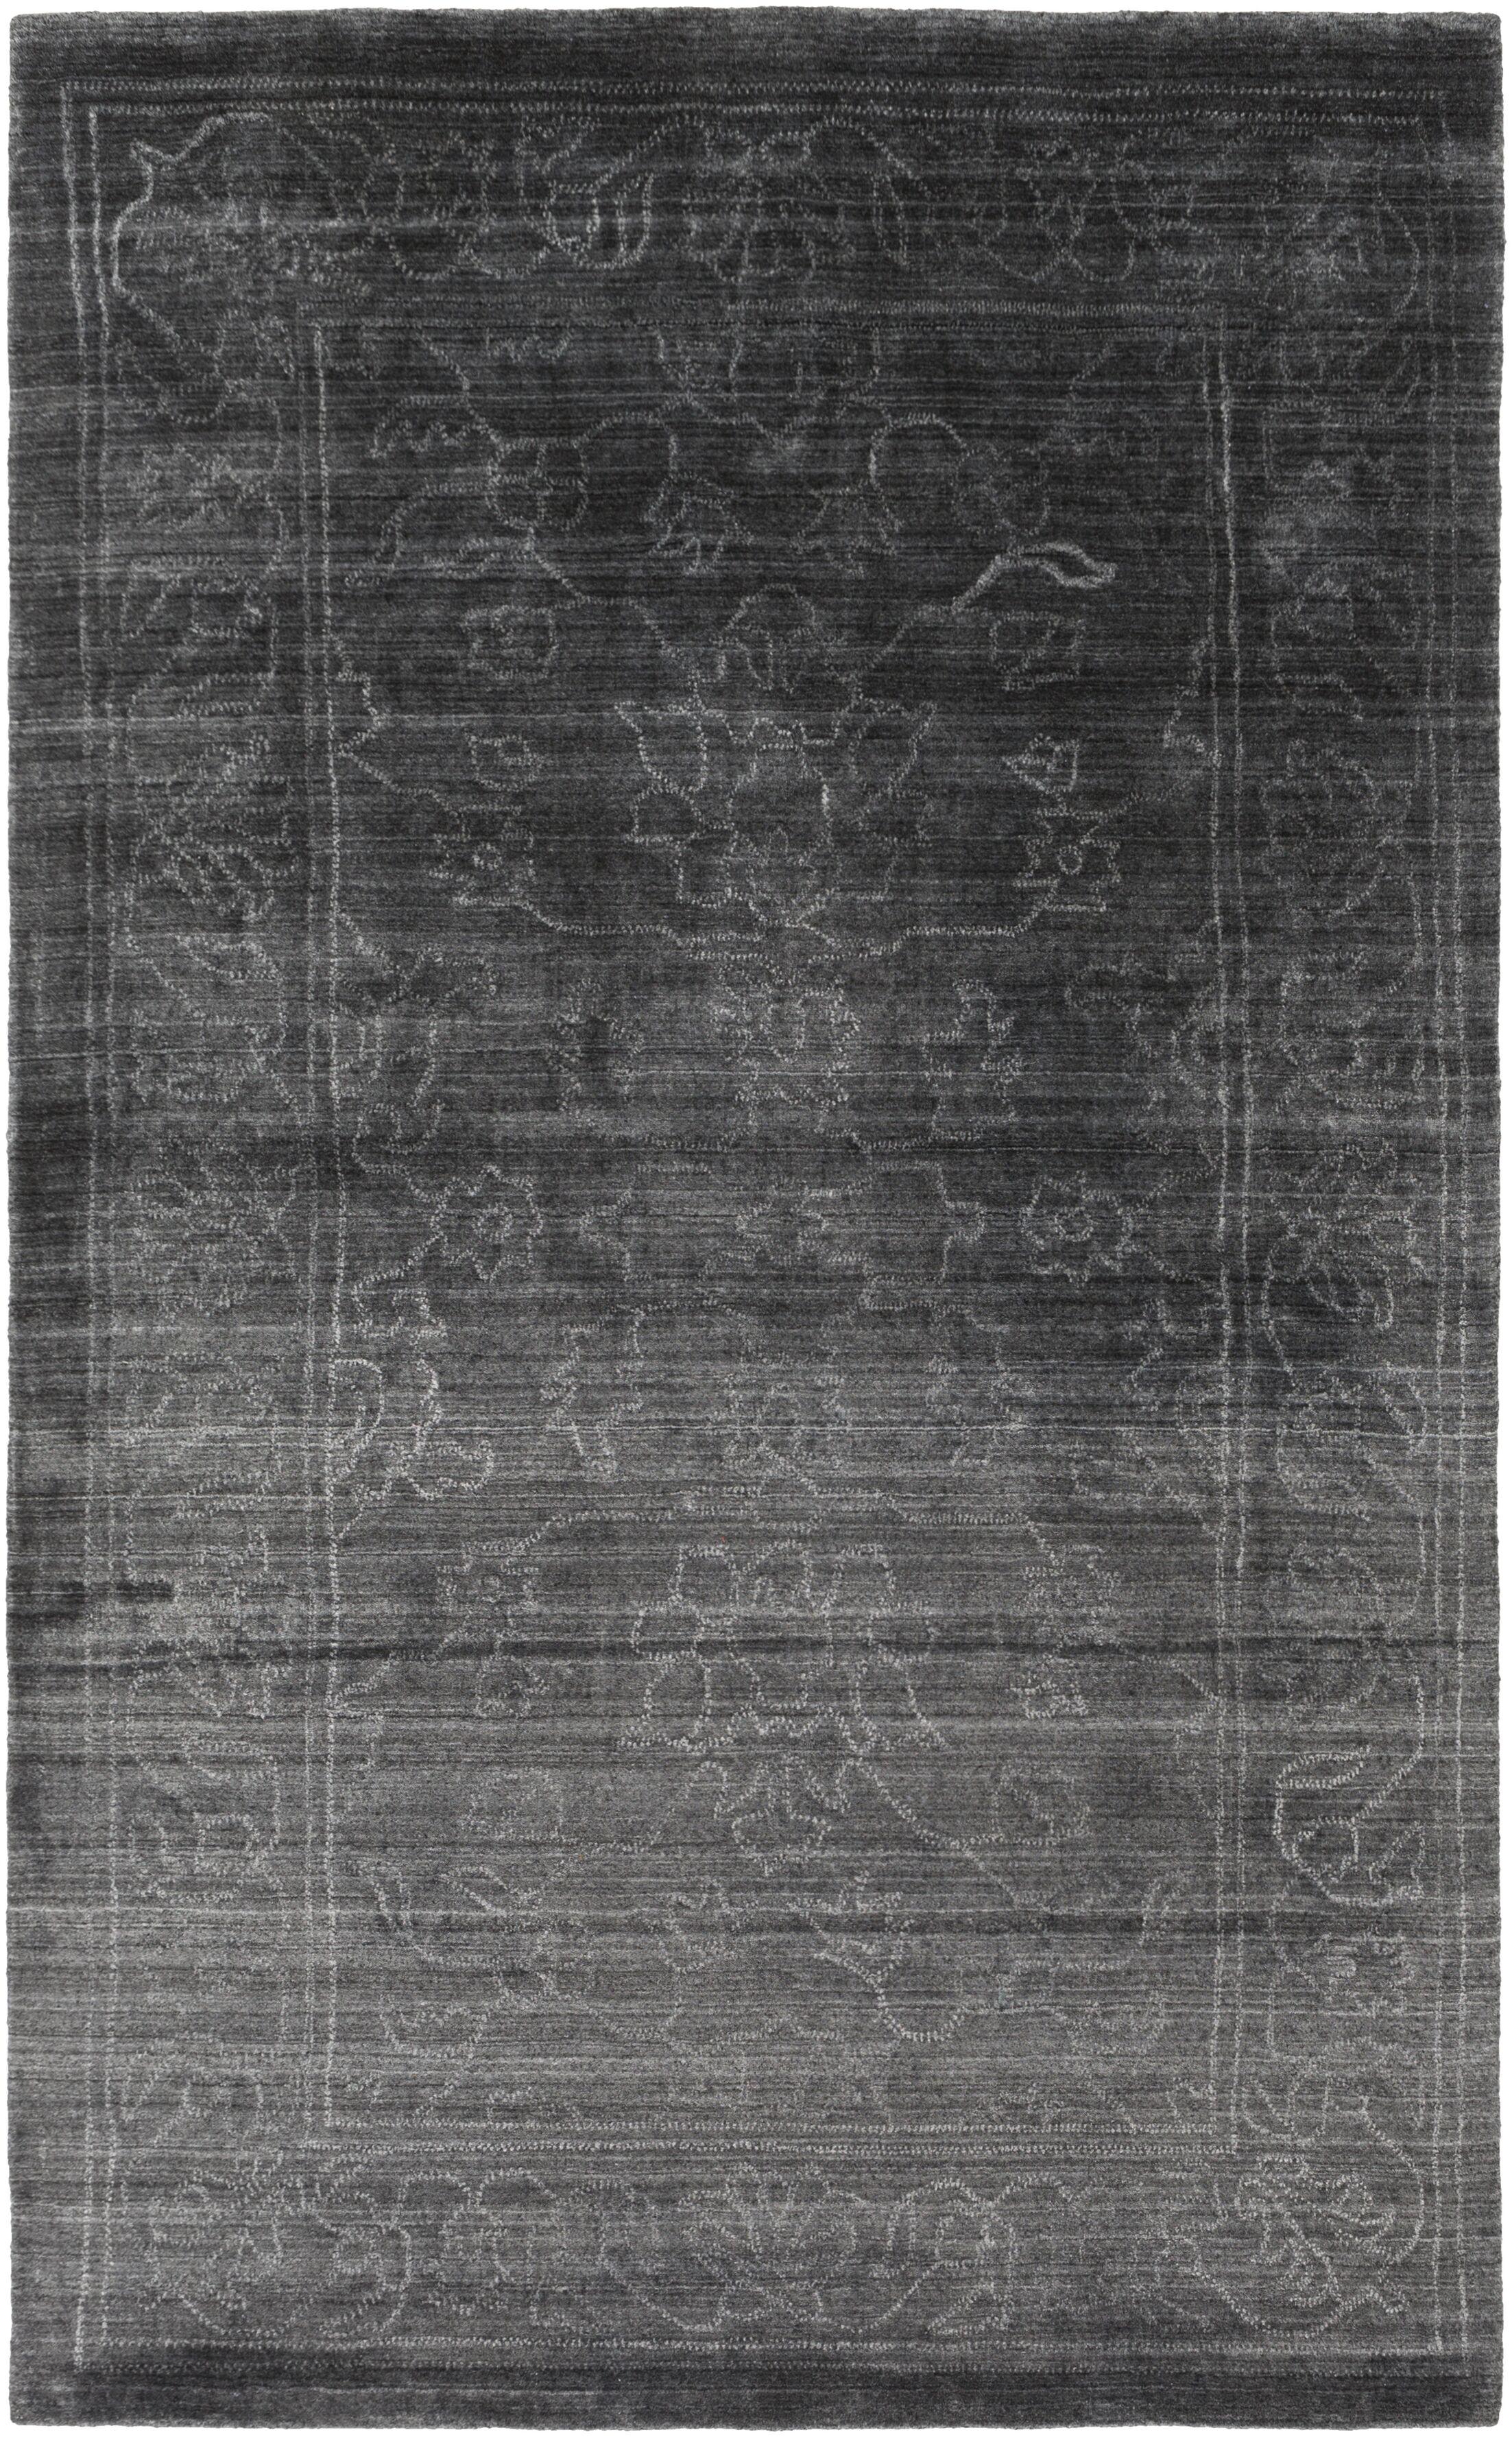 Cernobbio Hand-Woven Black Area Rug Rug Size: Rectangle 9' x 13'